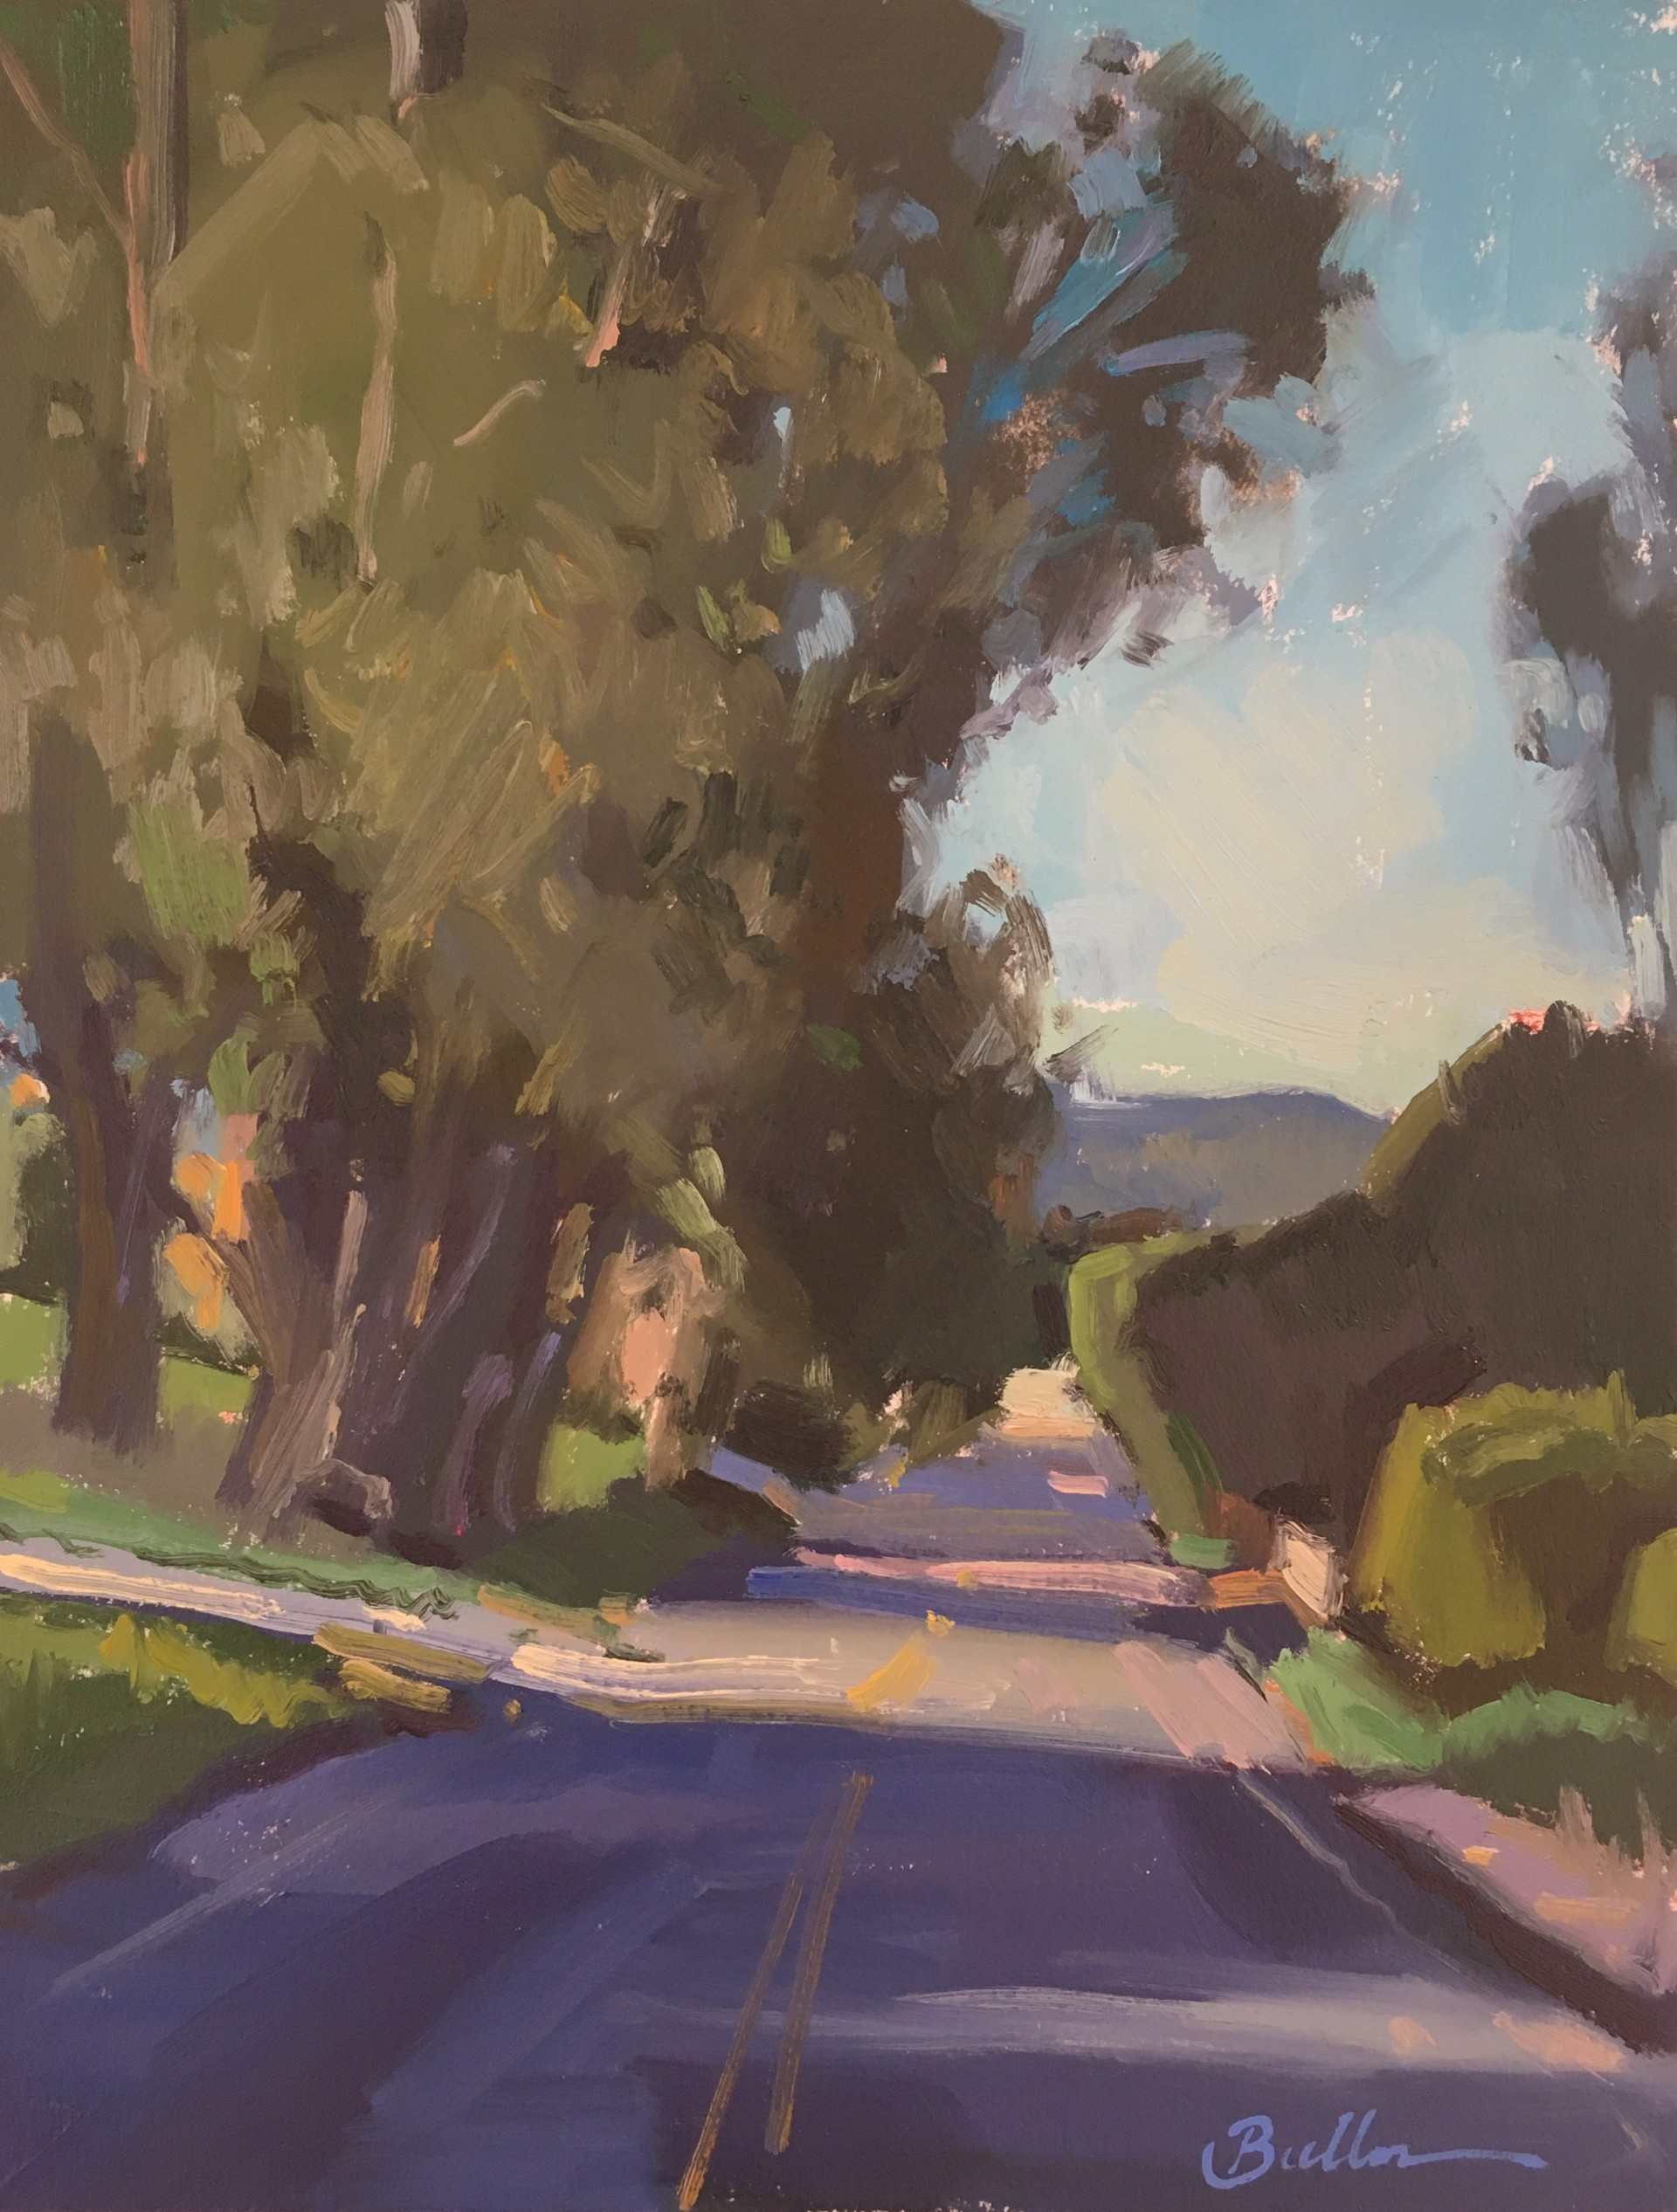 Road Patterns by Samantha Buller